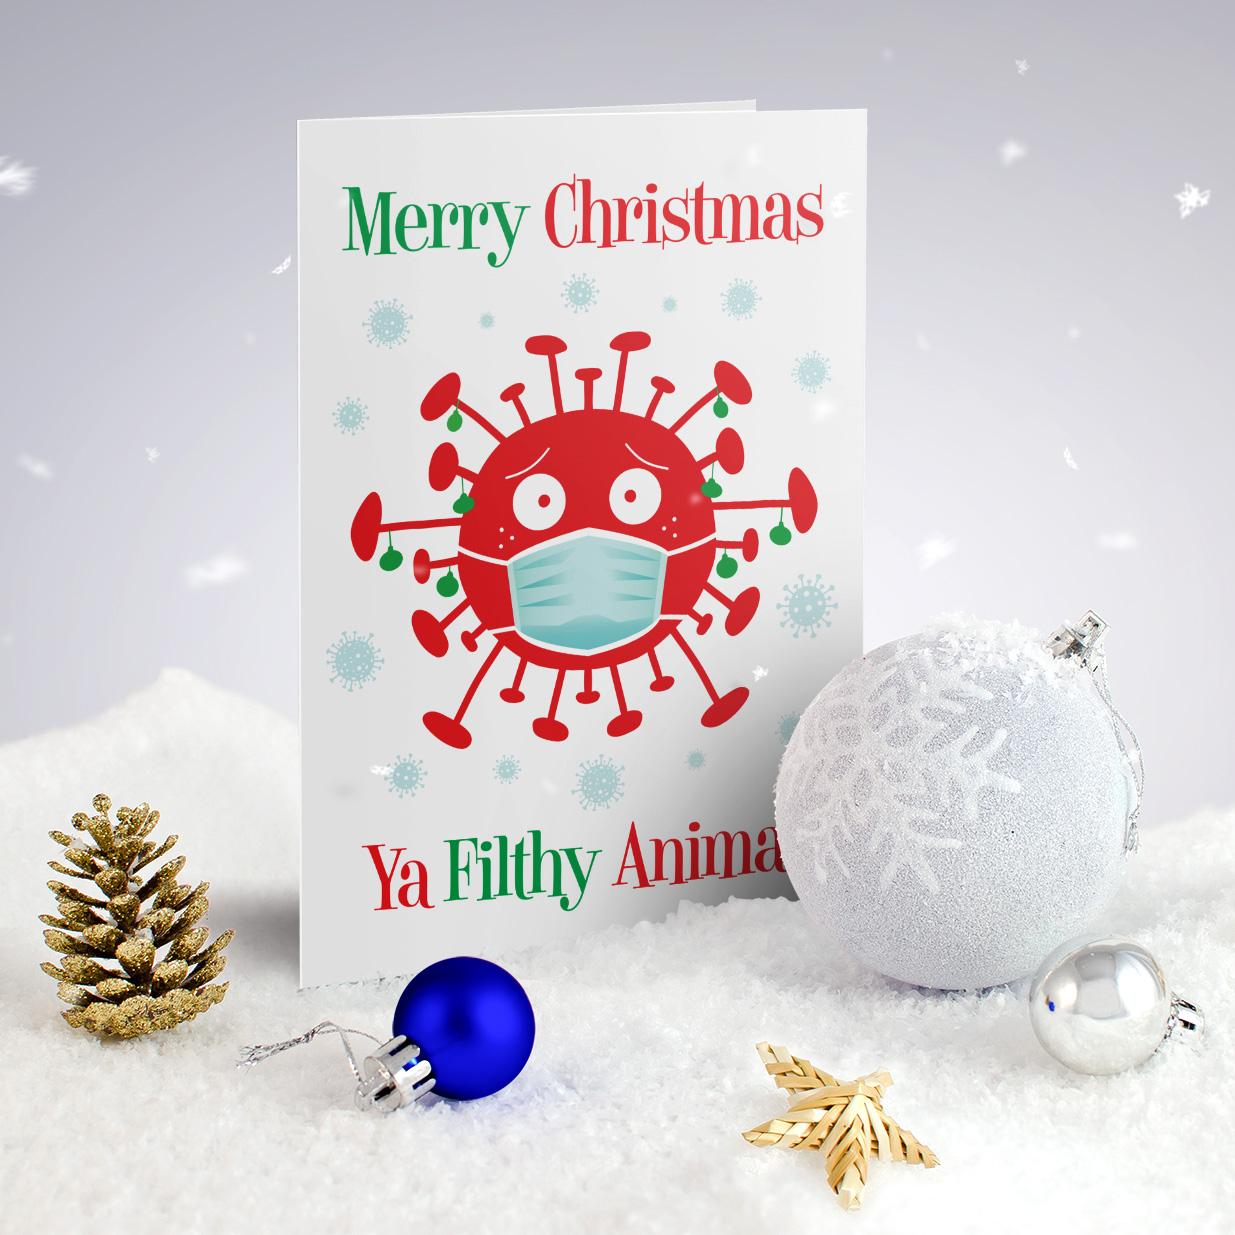 Merry Christmas ya filthy animal coronavirus covid 19 funny lockdown Christmas card